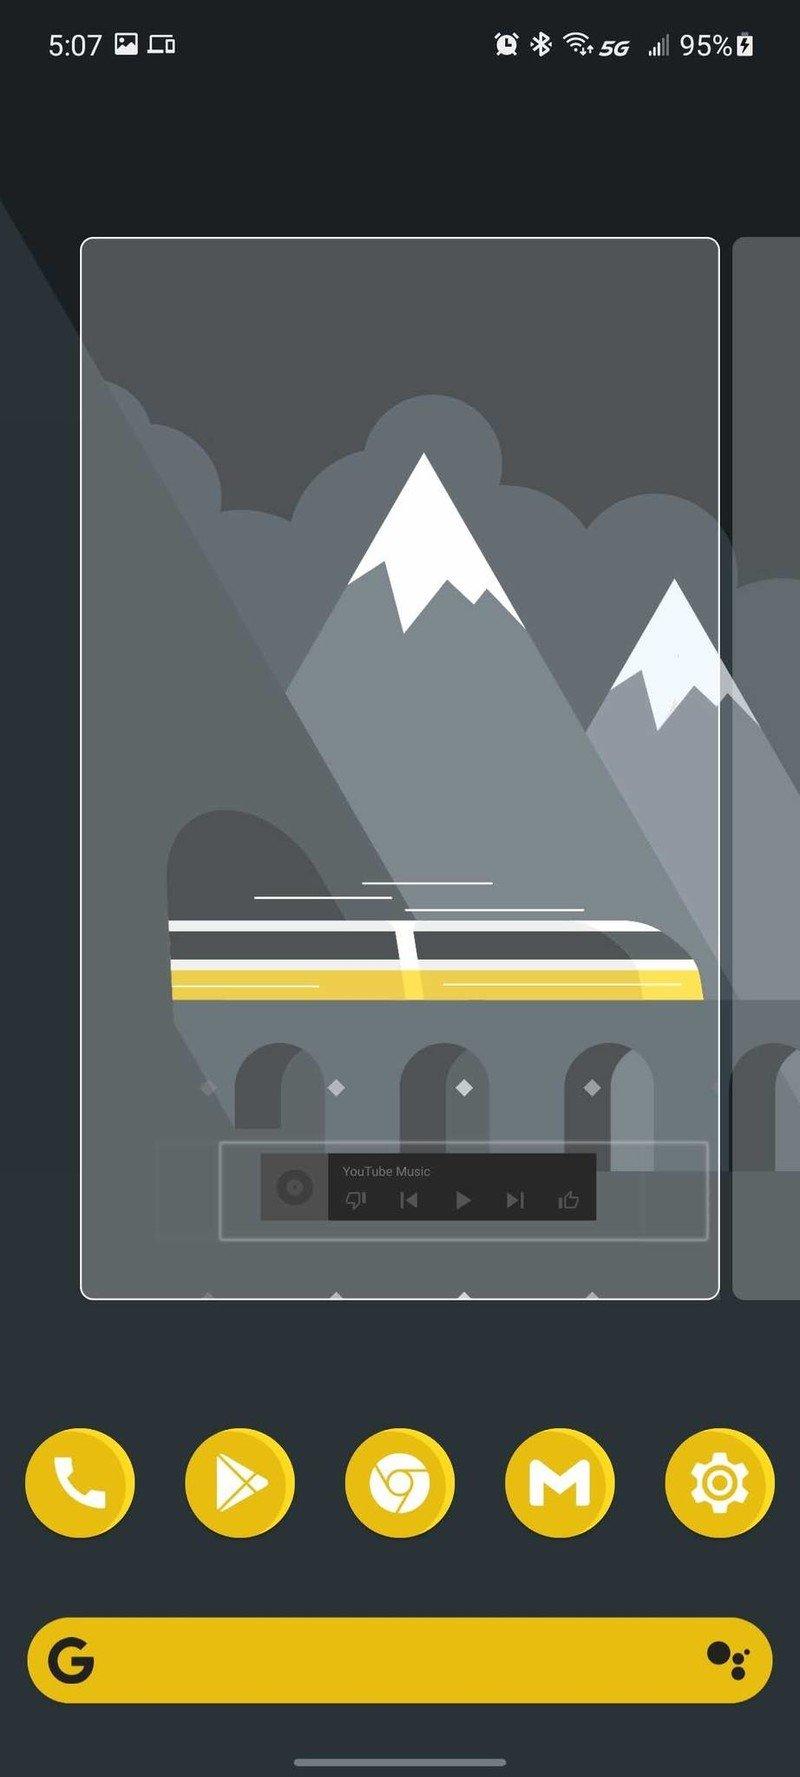 add-widget-nova-launcher-4.jpg